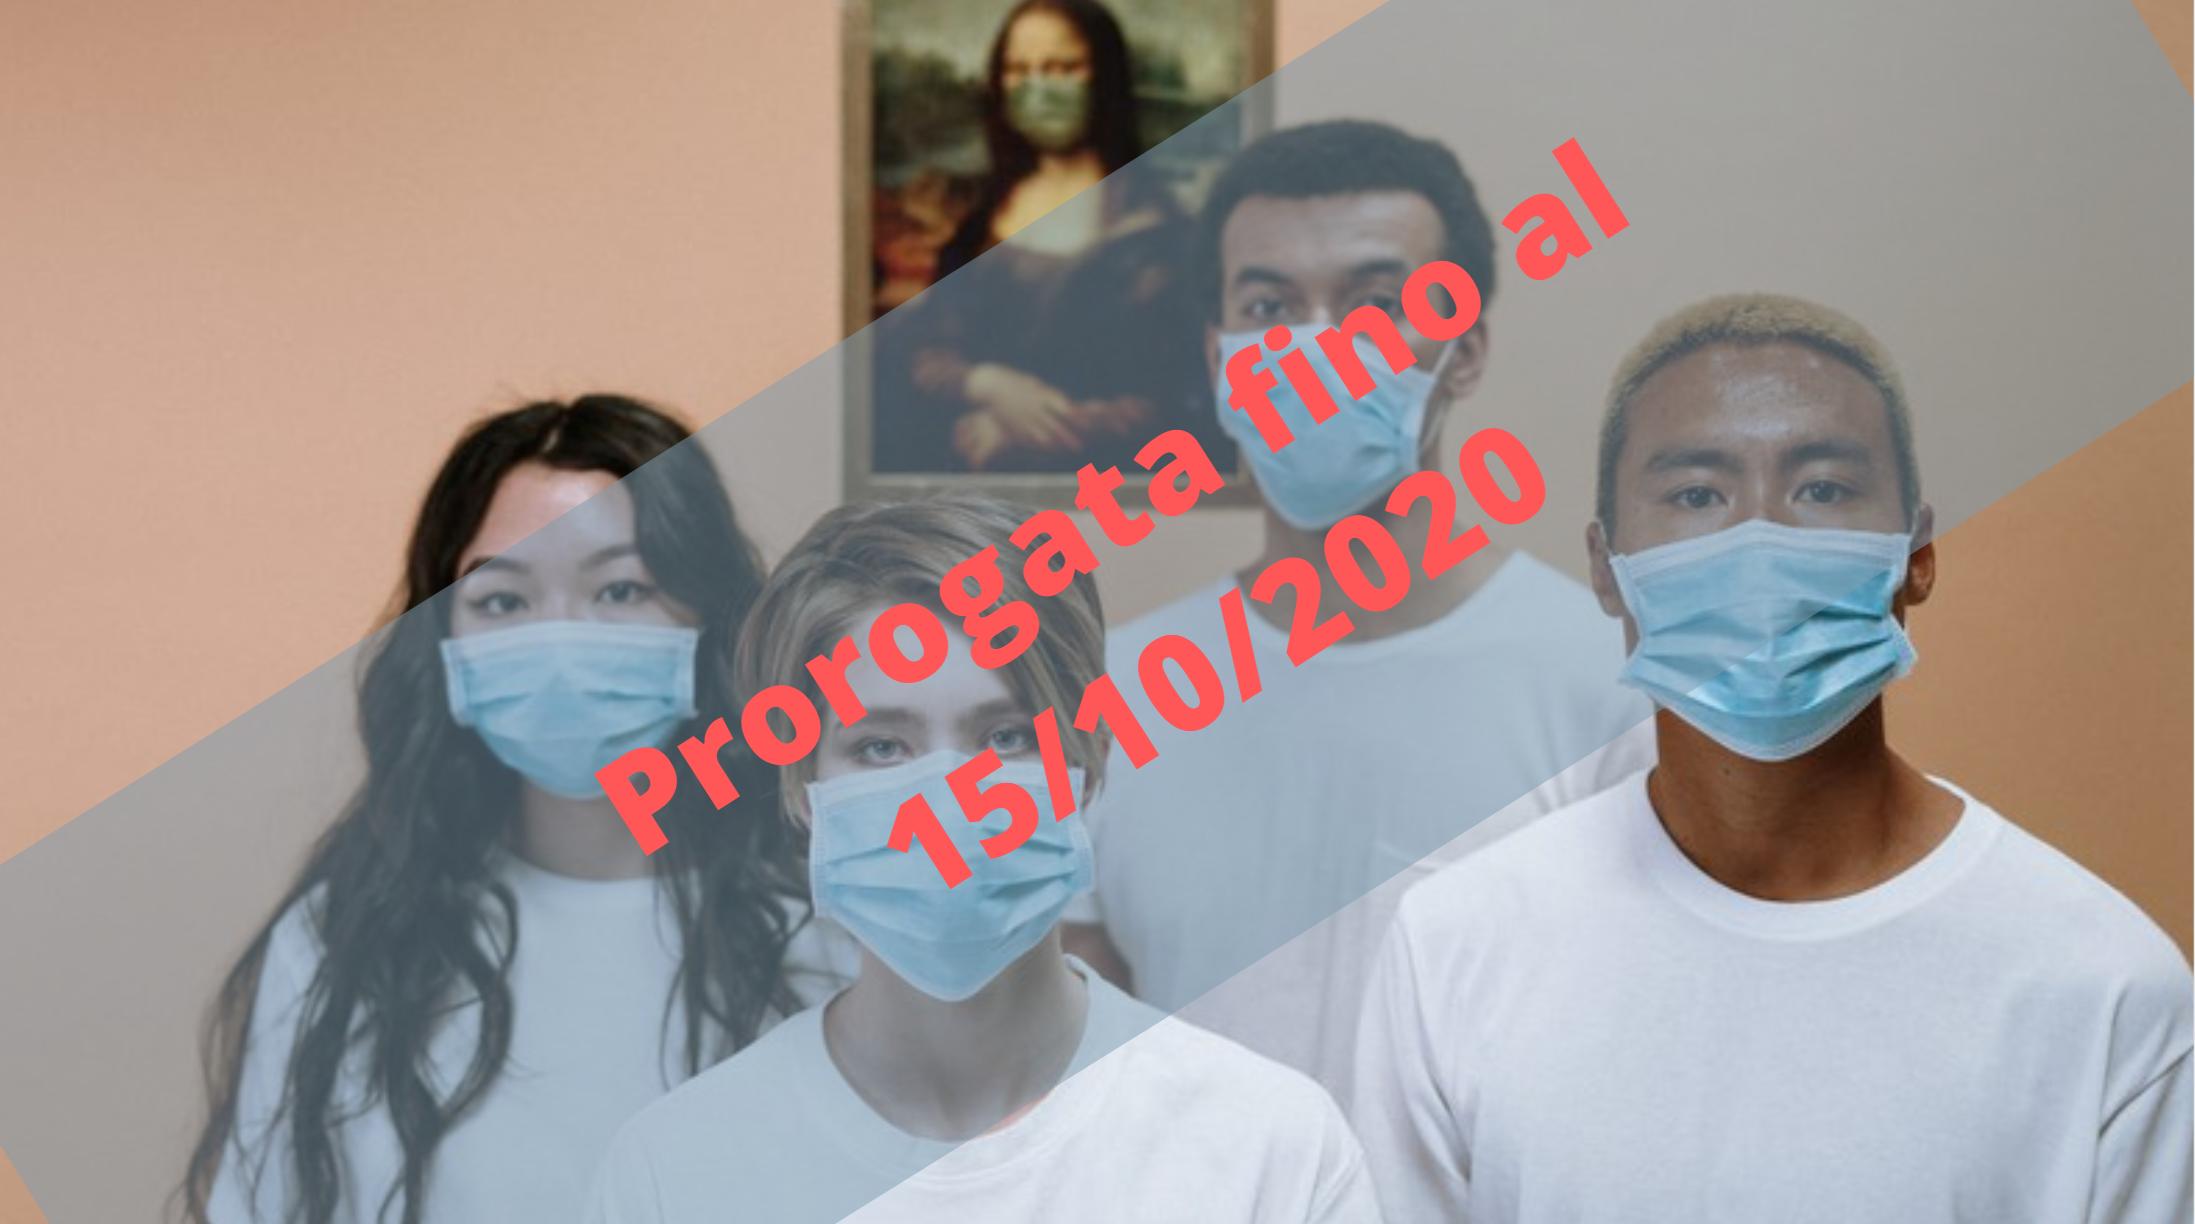 proroga quarantena lavoratori stranieri